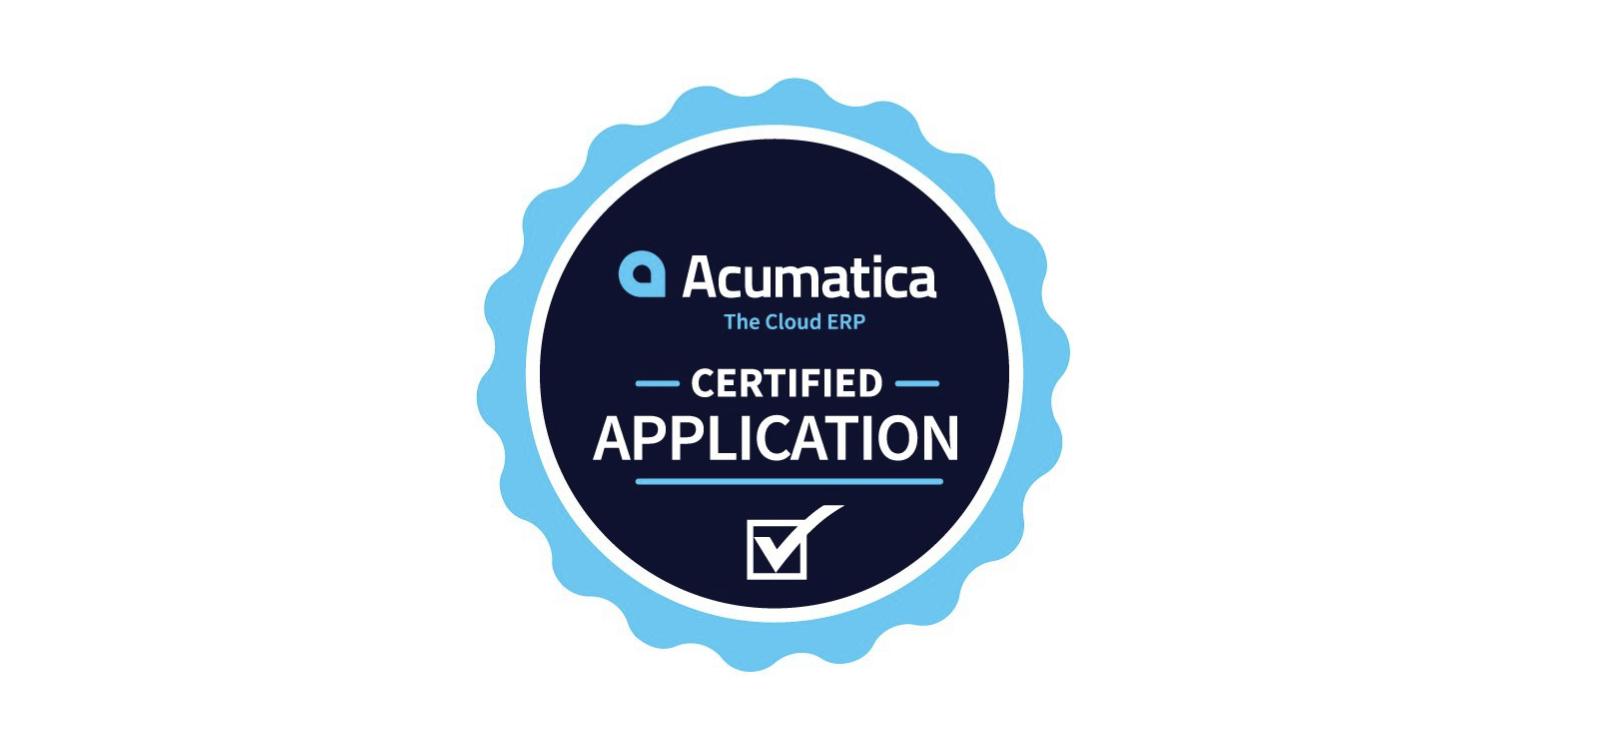 Acumatica_Certified_Application